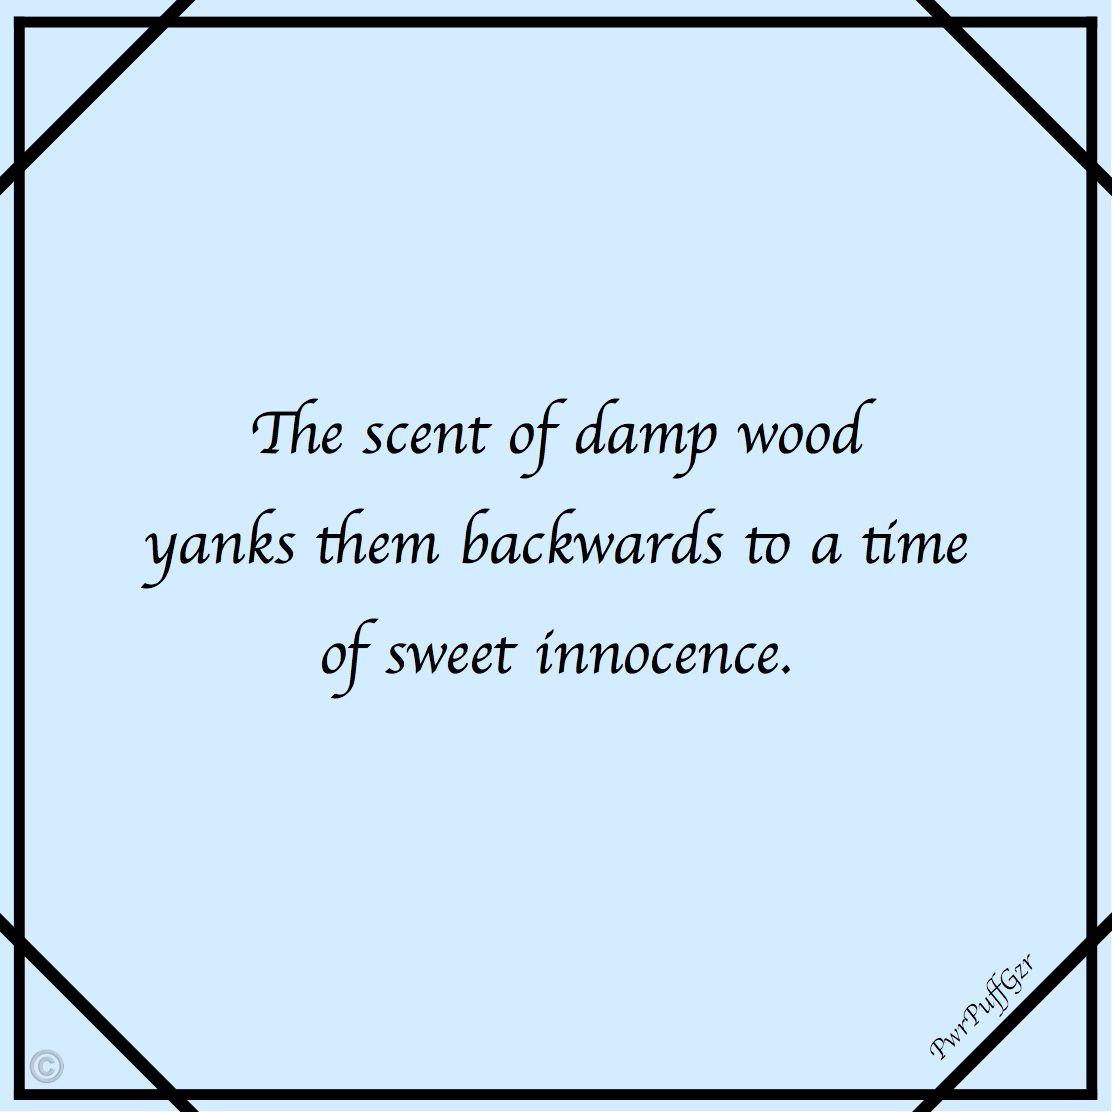 Haiku Damp Wood Haiku 5 7 5s Micro Poems Haiku Und